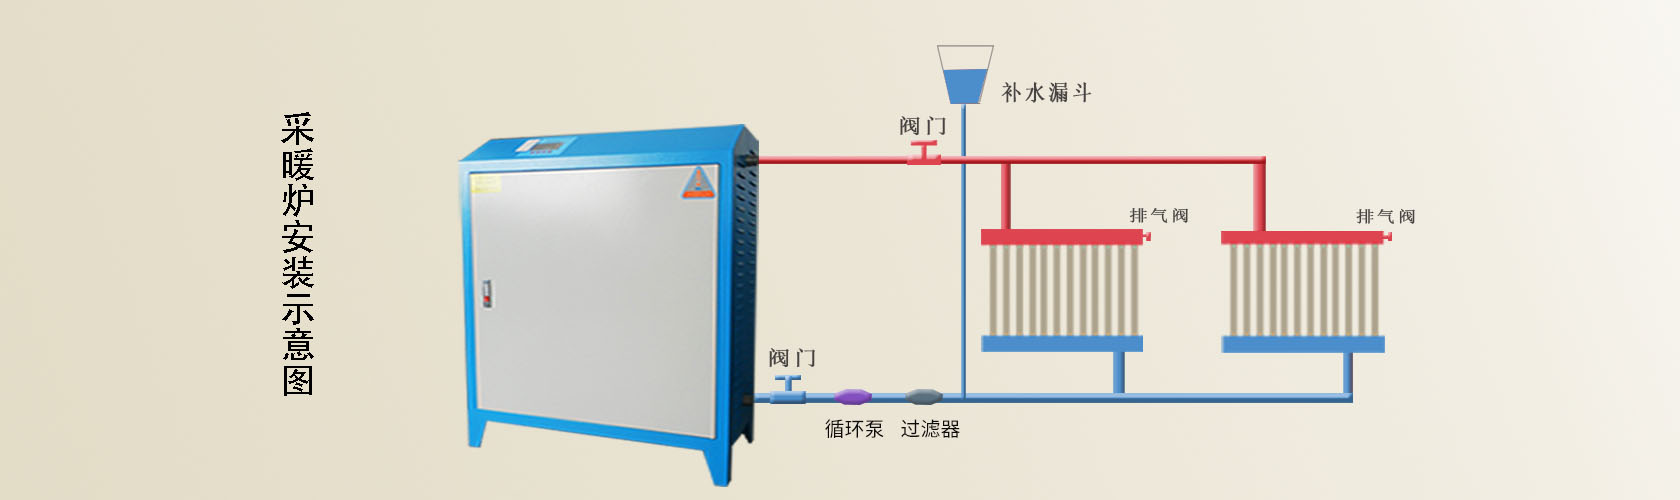 10kw电锅炉安装示意图